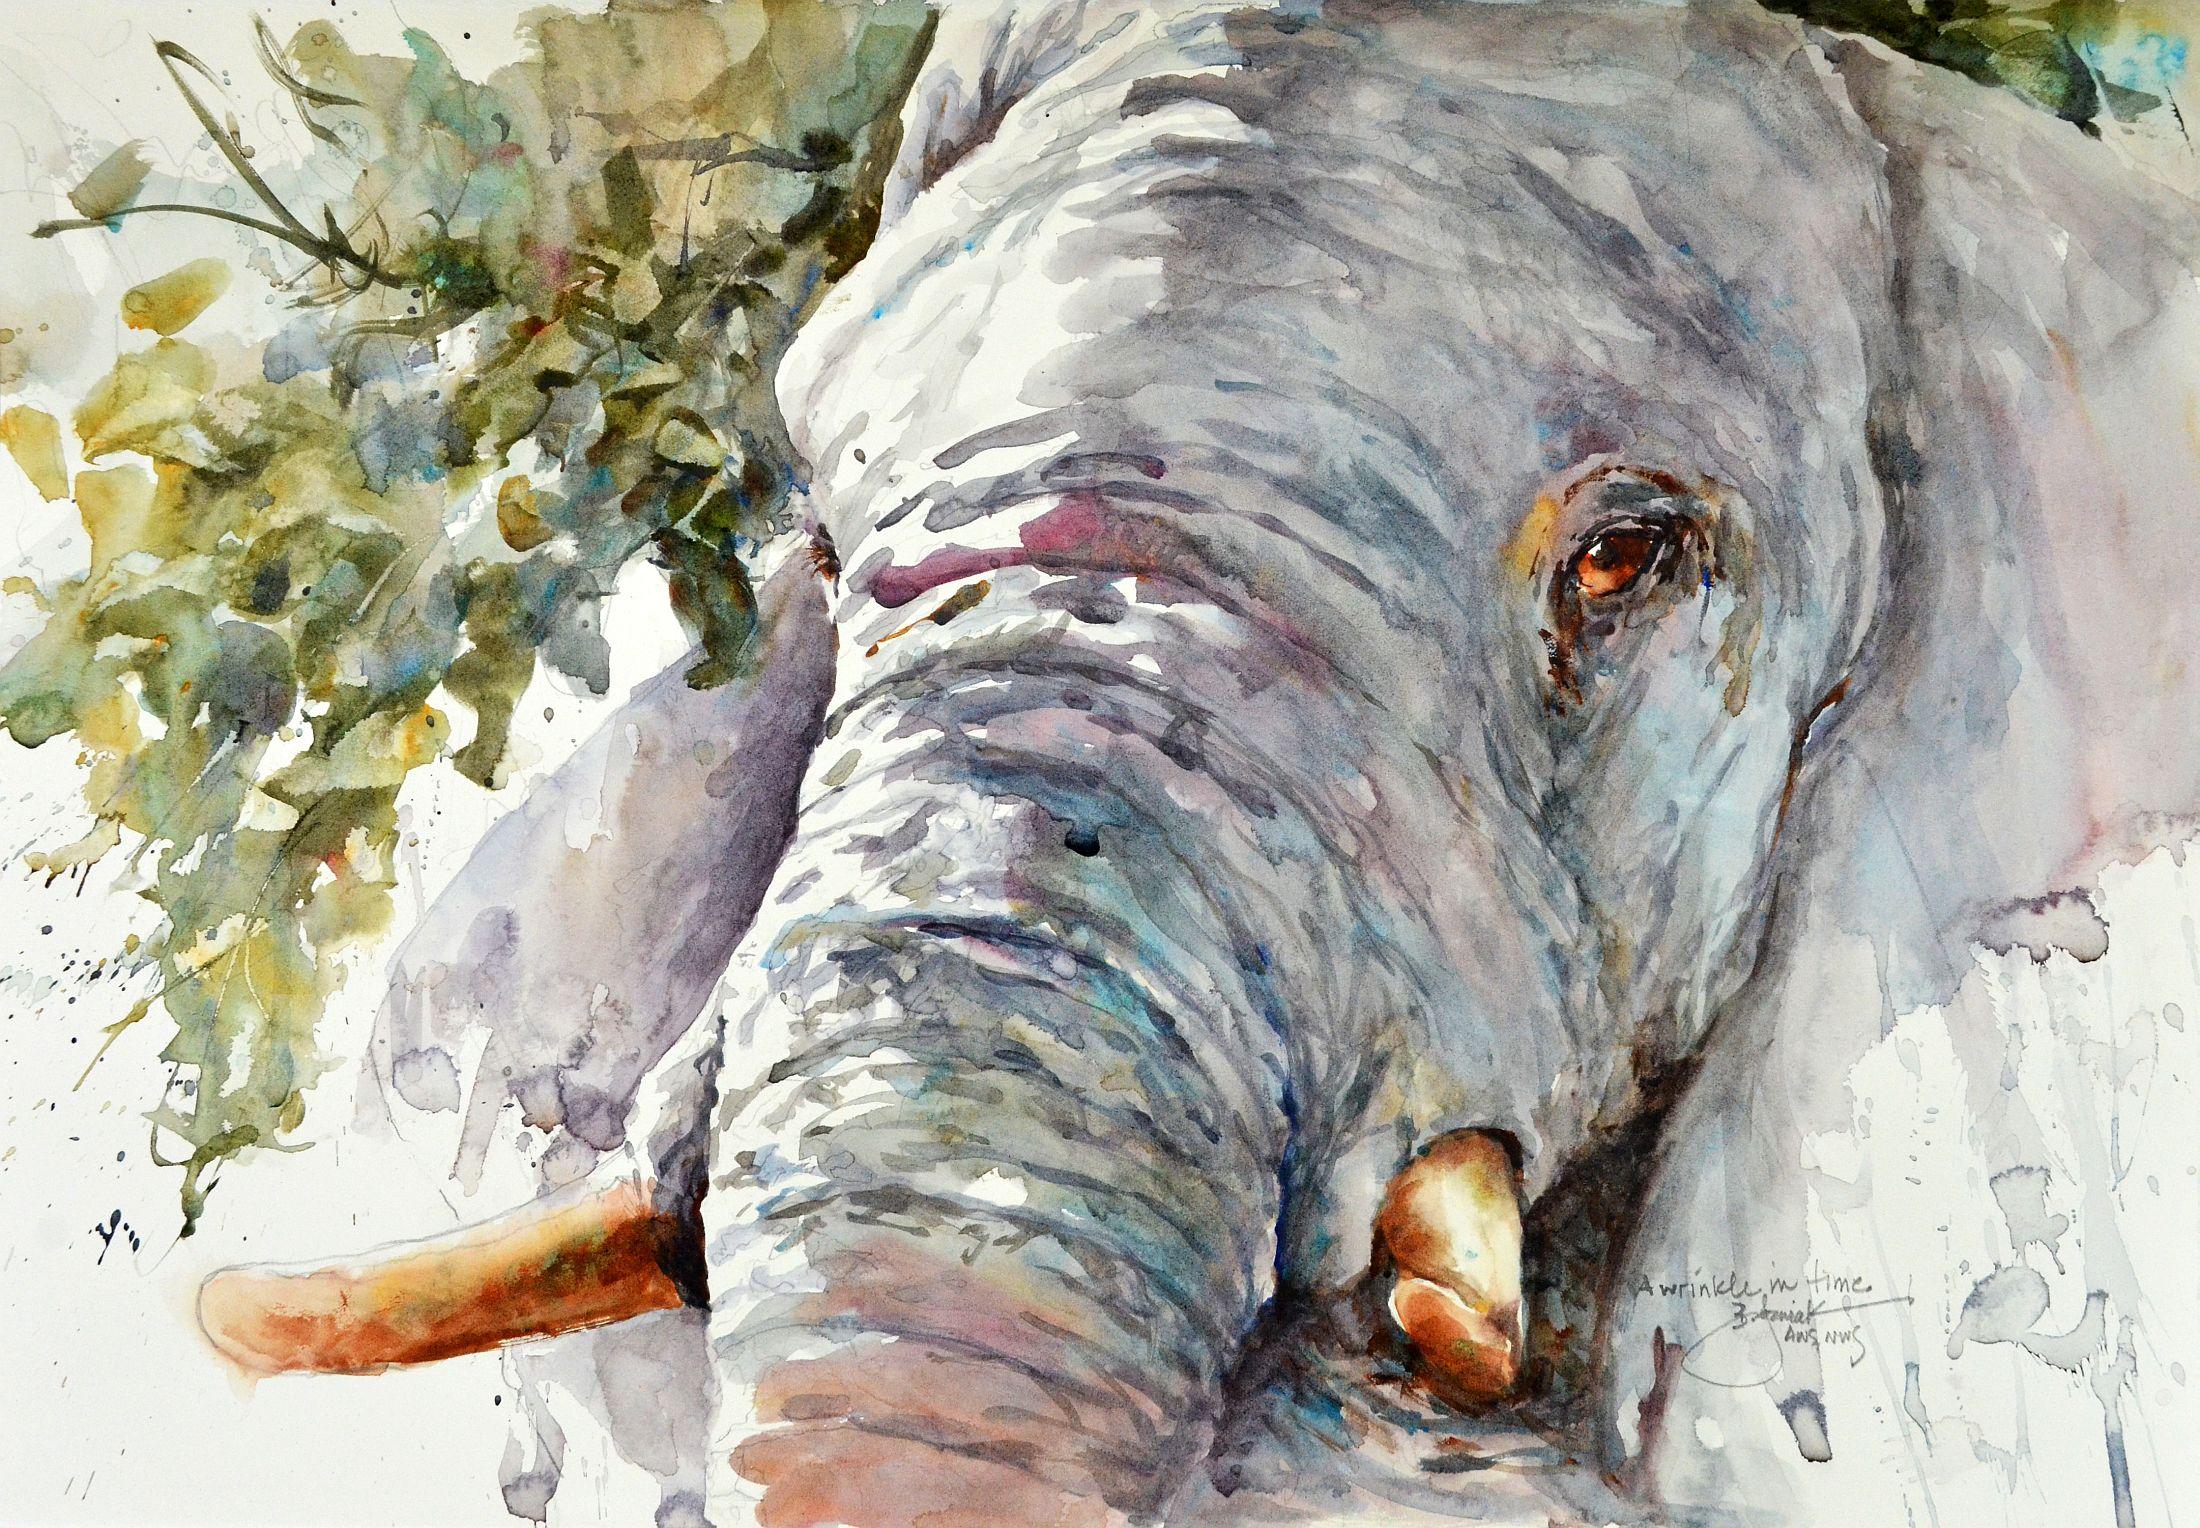 Bev Jozwiak, A Wrinkle in Time, Watercolor on Stonehenge Aqua Hotpress